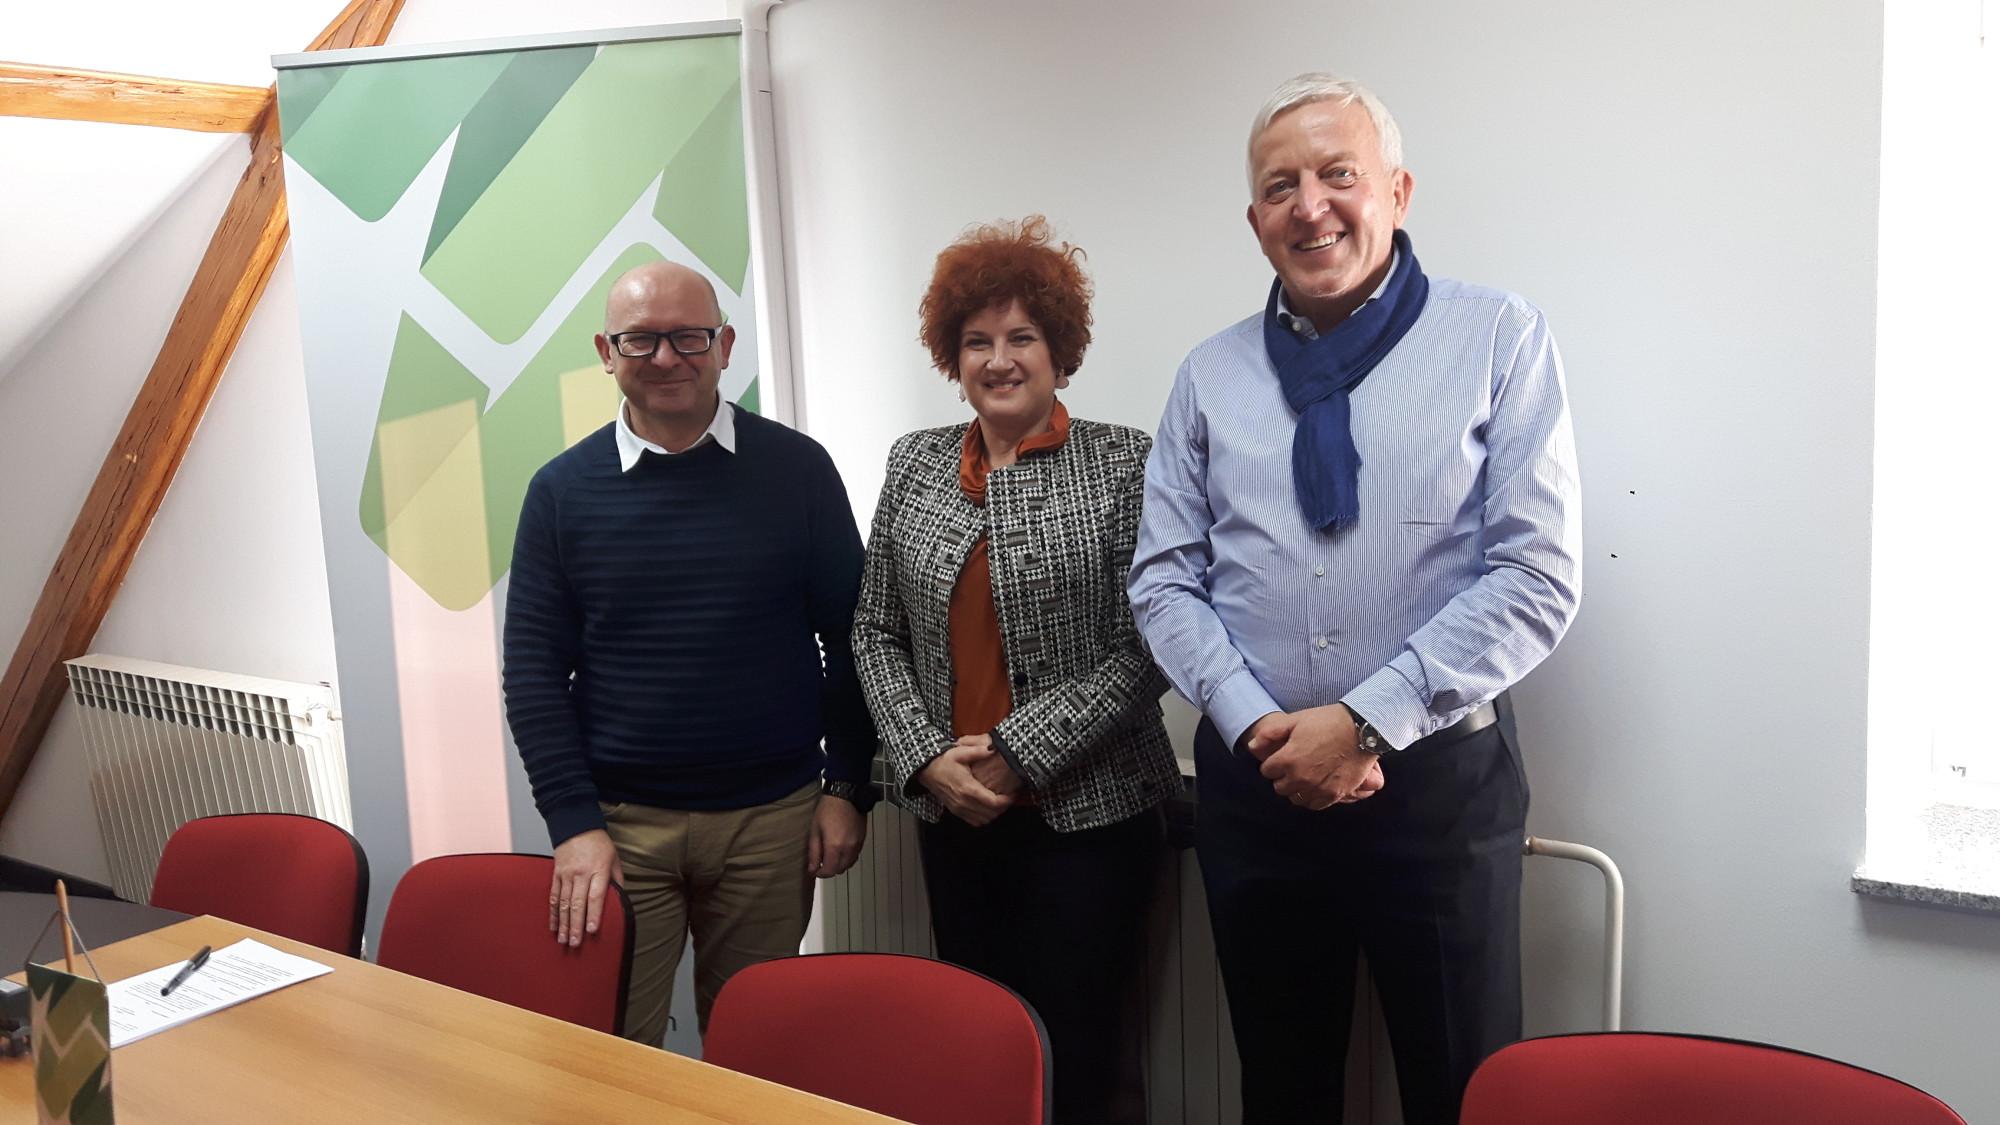 Alen Golja, Gloria Paliska i Branko Kontošić